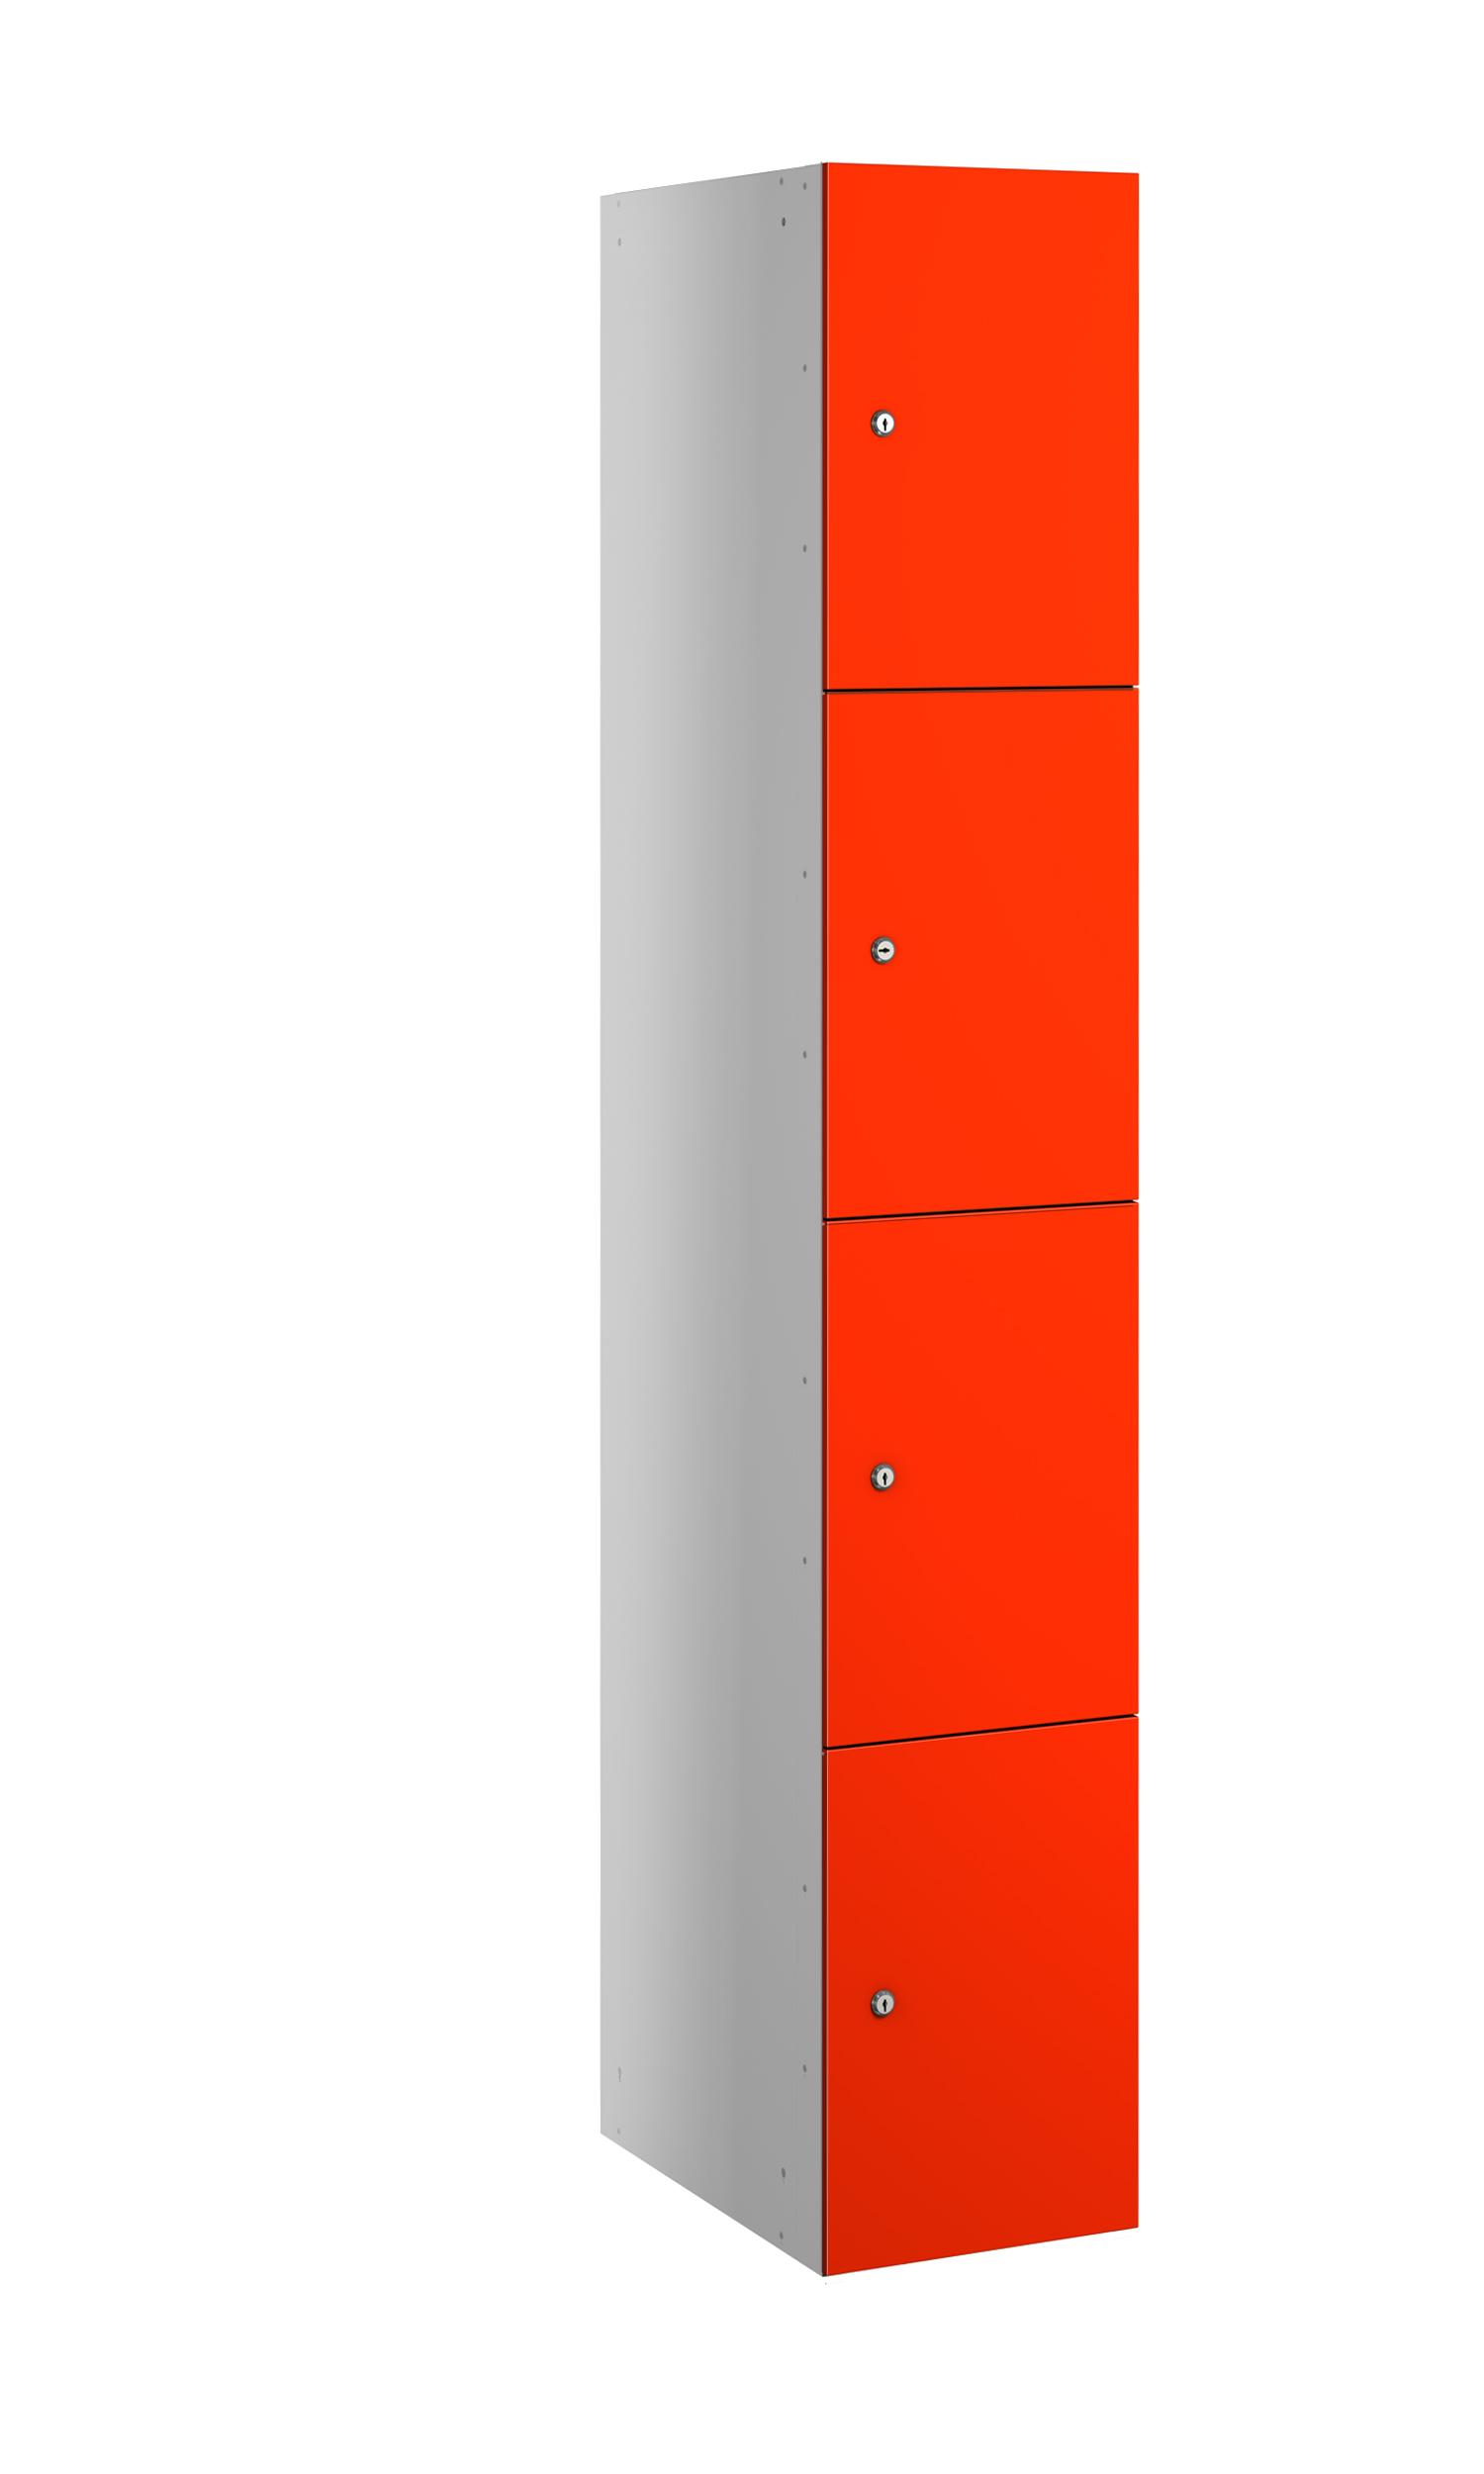 Probe buzzbox laminate 4 doors in orange colour